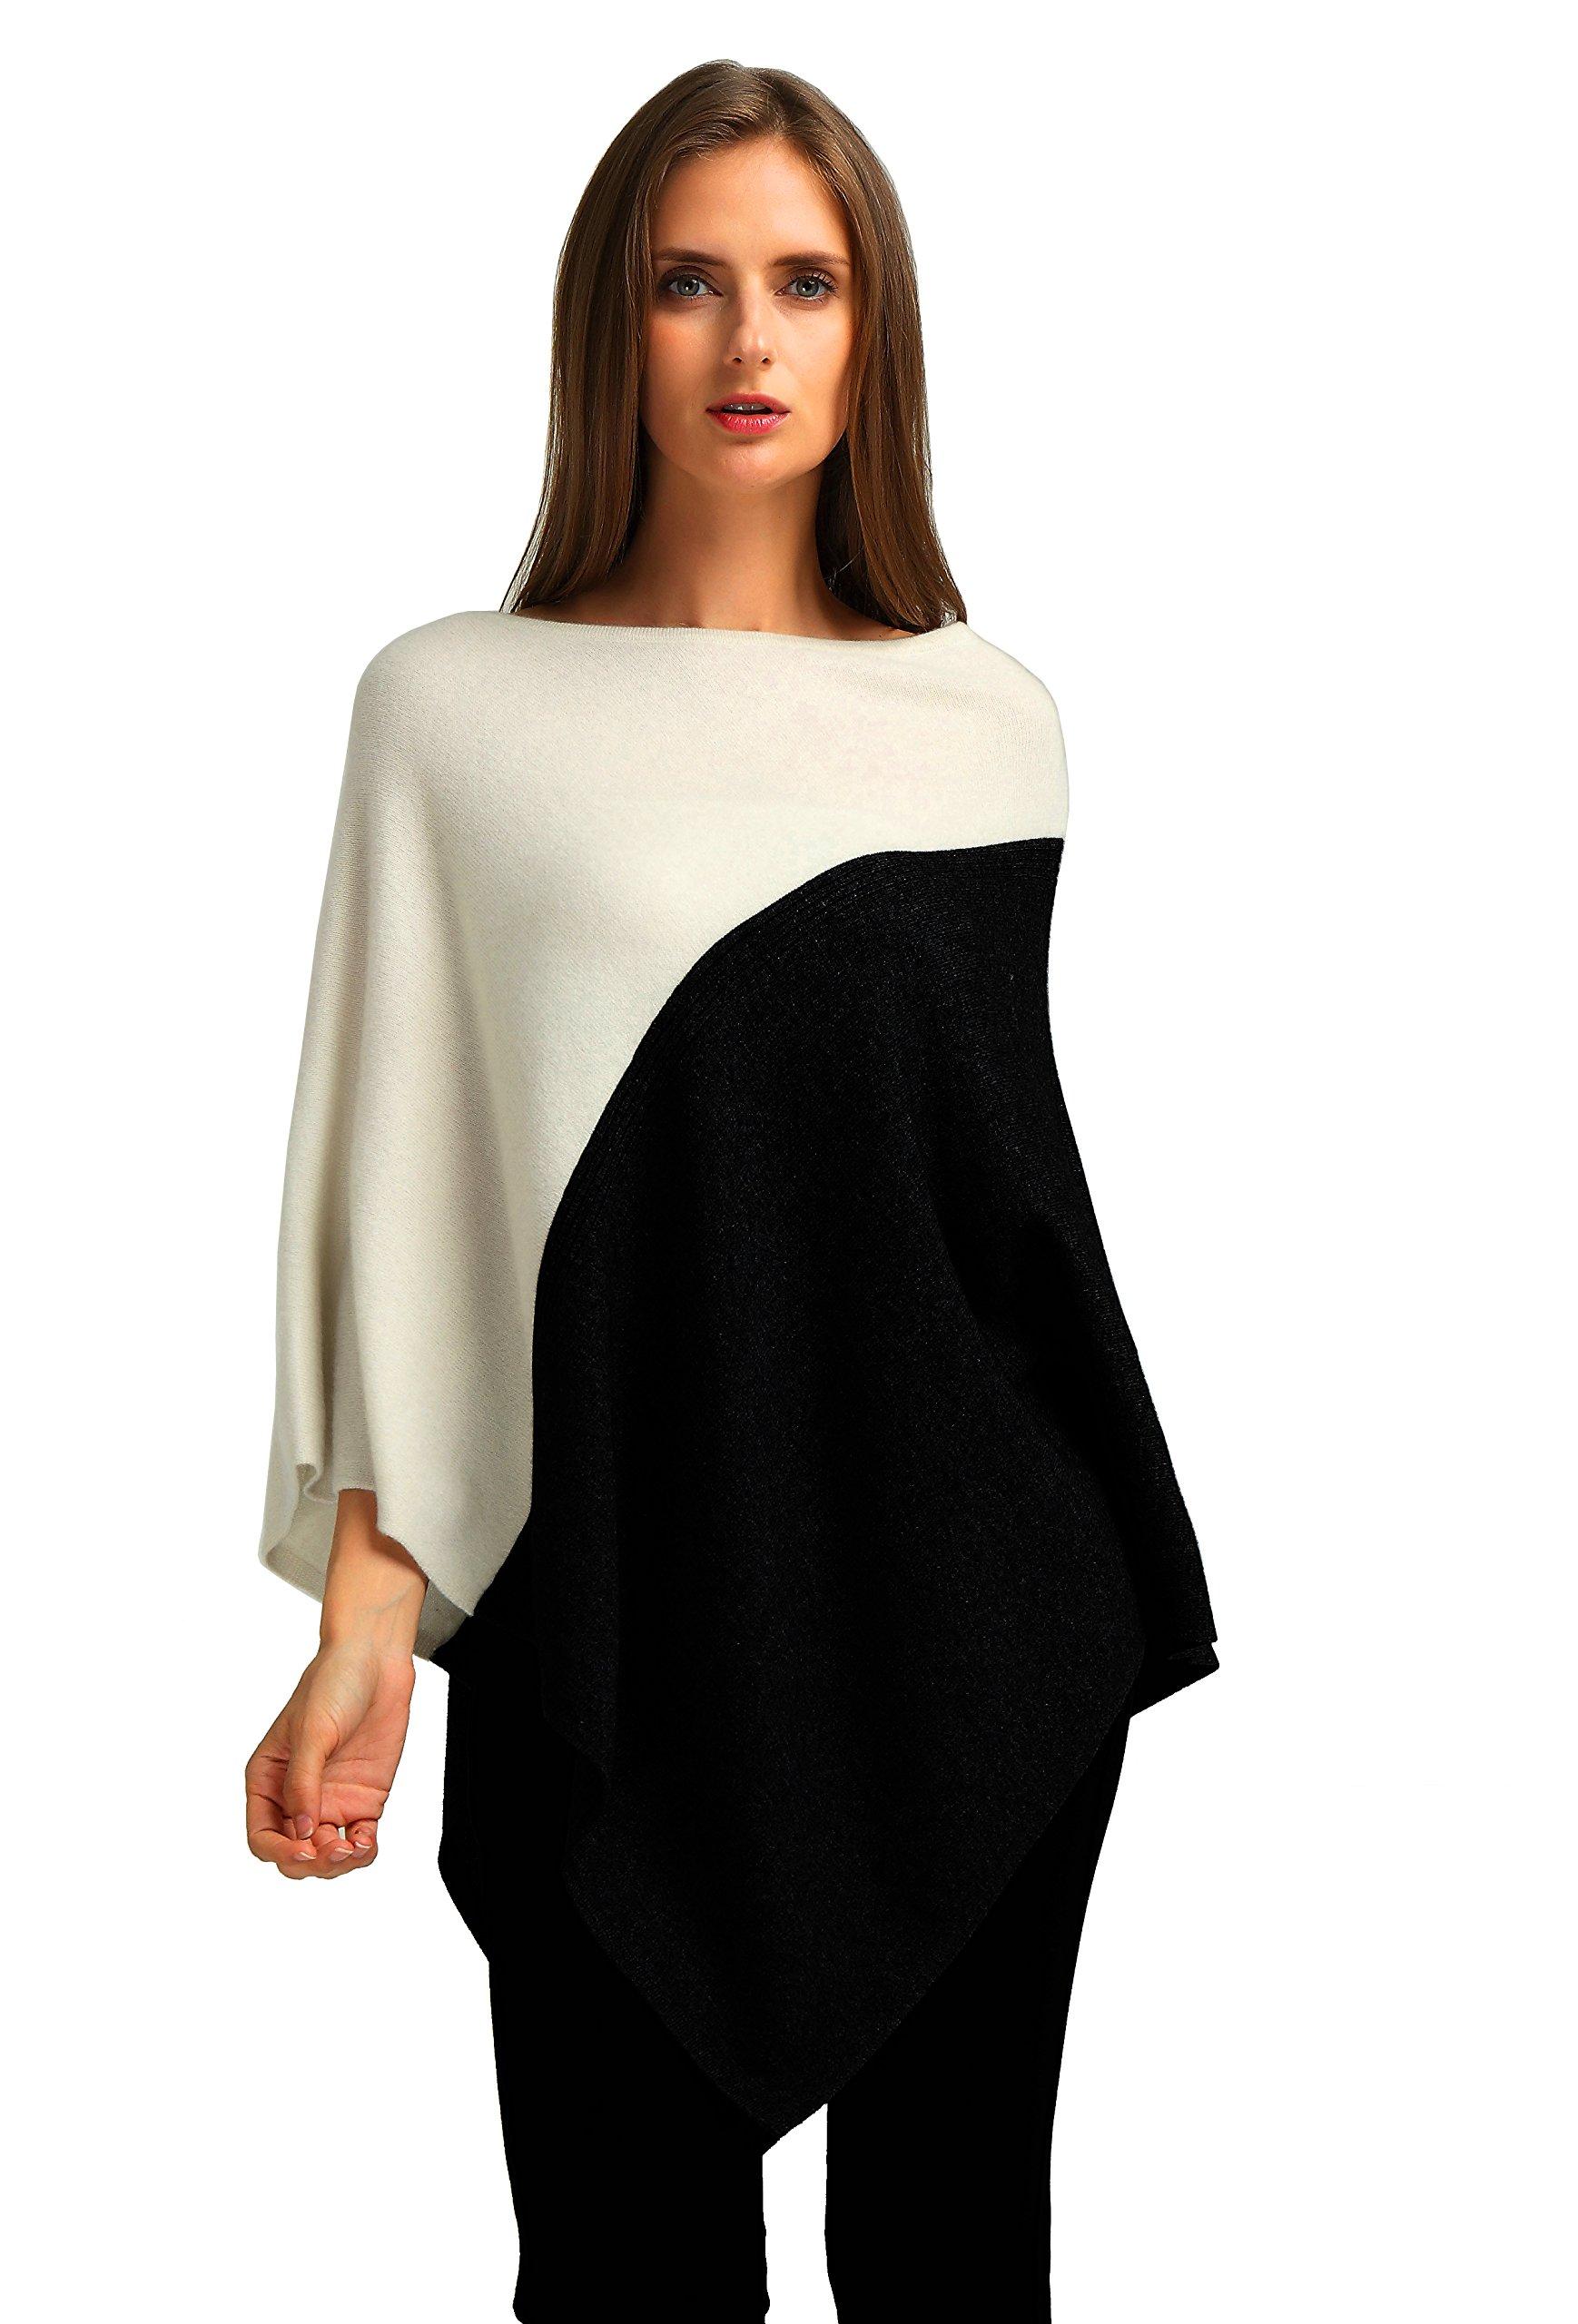 Ellettee, Black-White 96% Pure Cashmere Knit Pullover Poncho Dress Topper Travel Wrap Shawl Cape Sweater Cloak